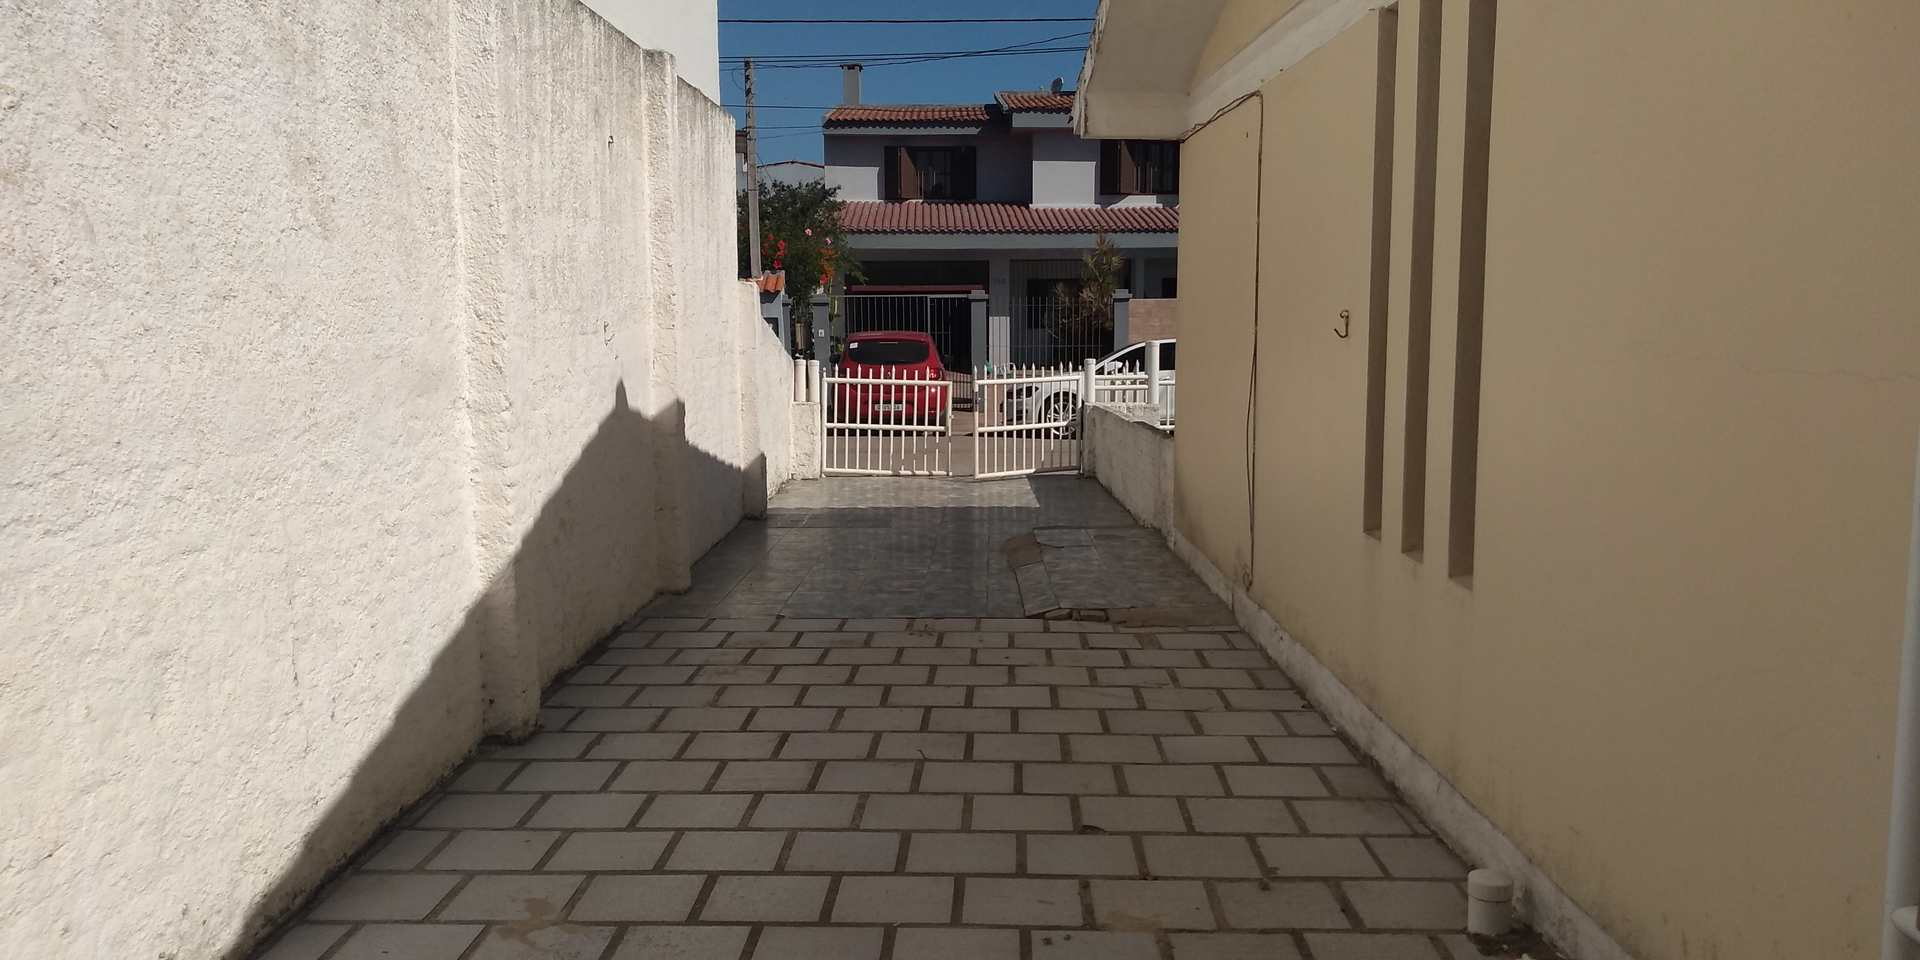 Kitnet, próximo do Mar e Avenida + Internet